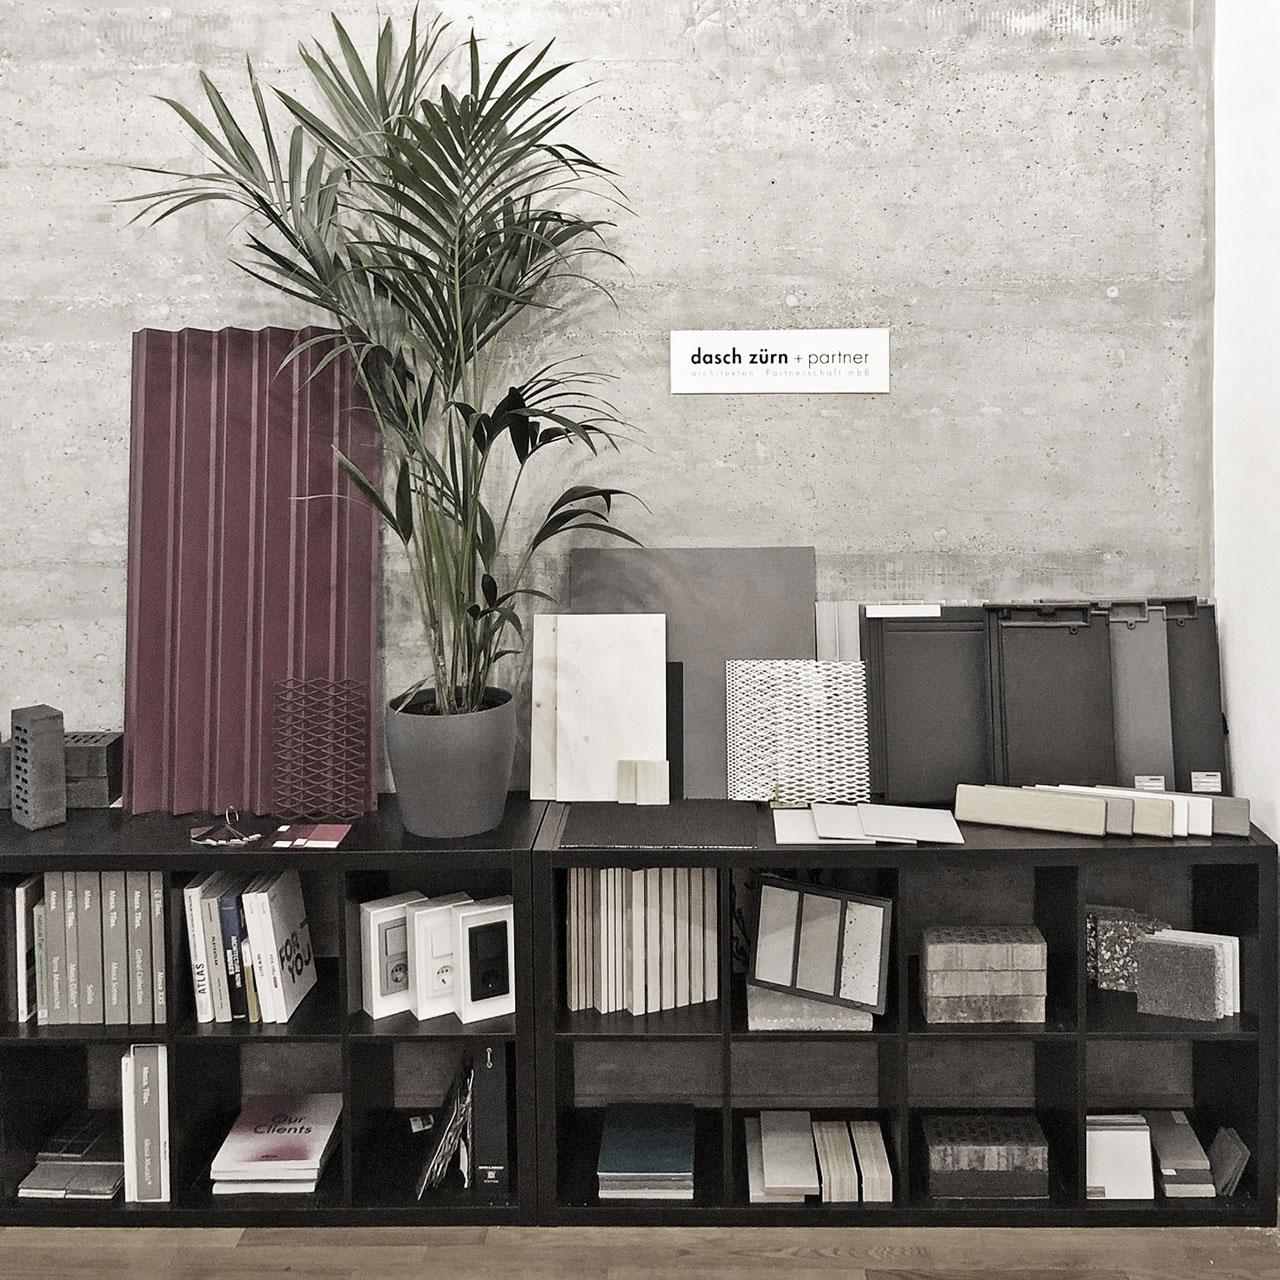 Musterbibliothek